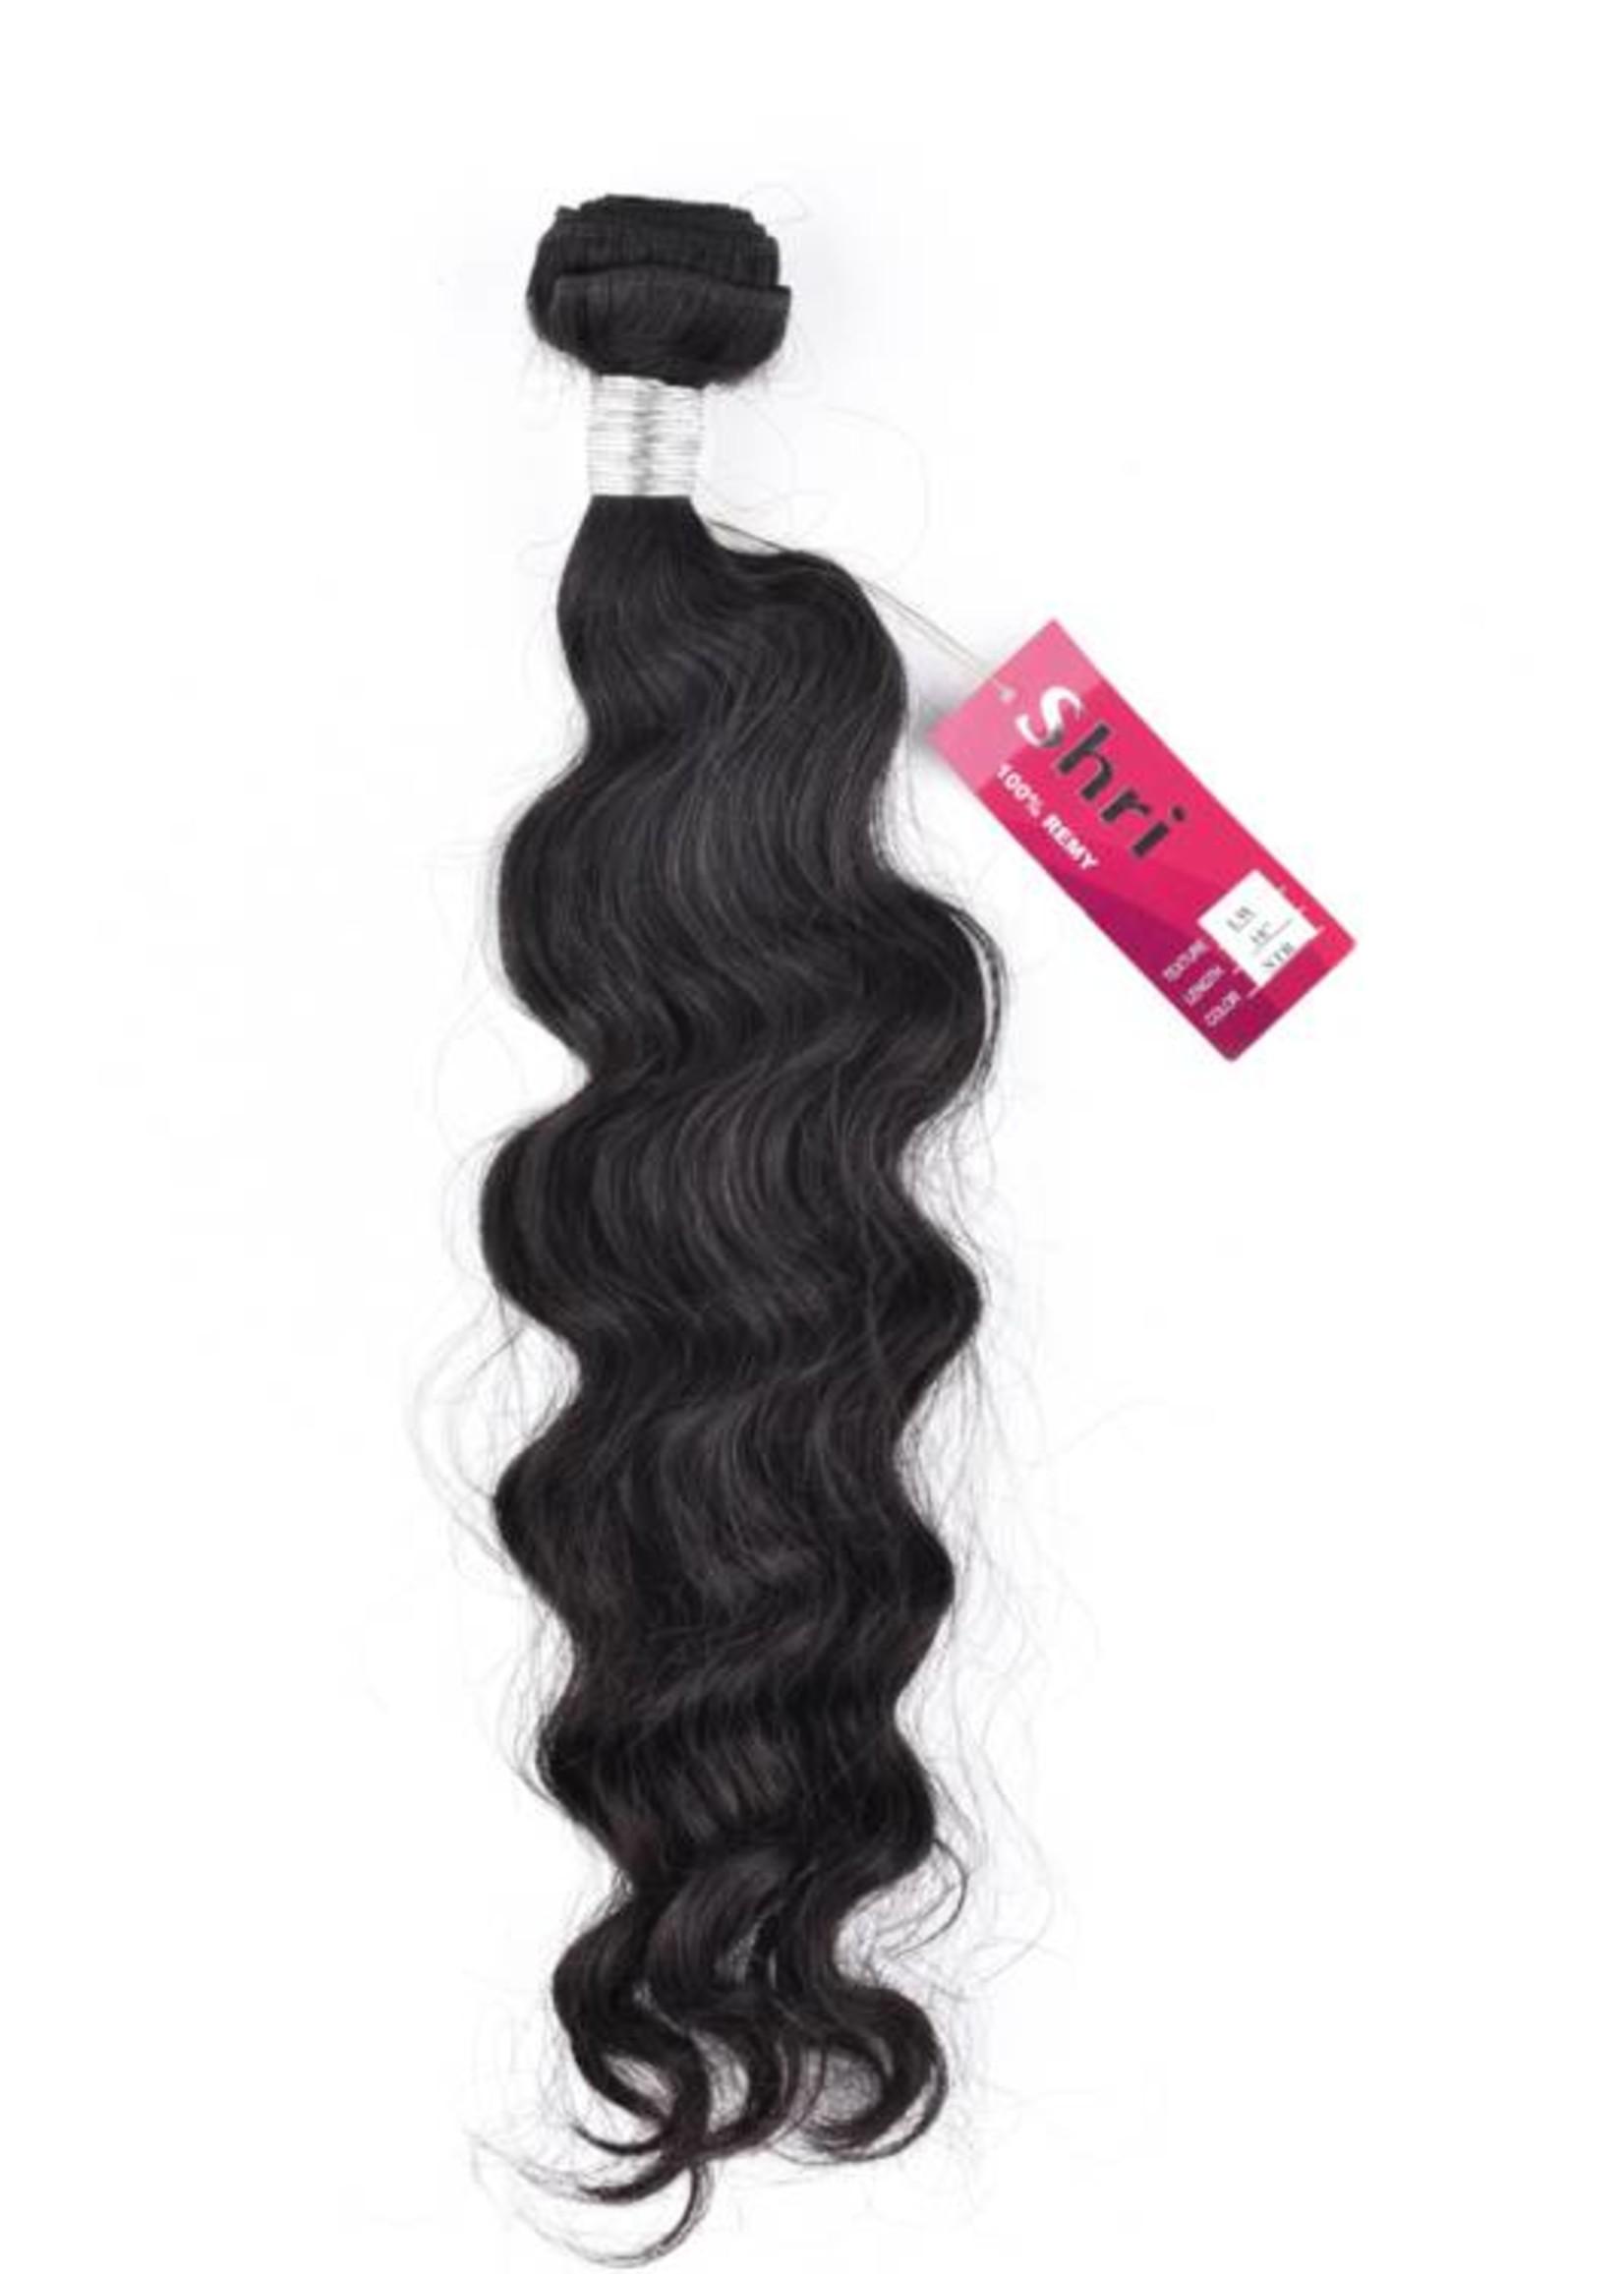 SHRI Indian (Shri) Hair weave (Curly)